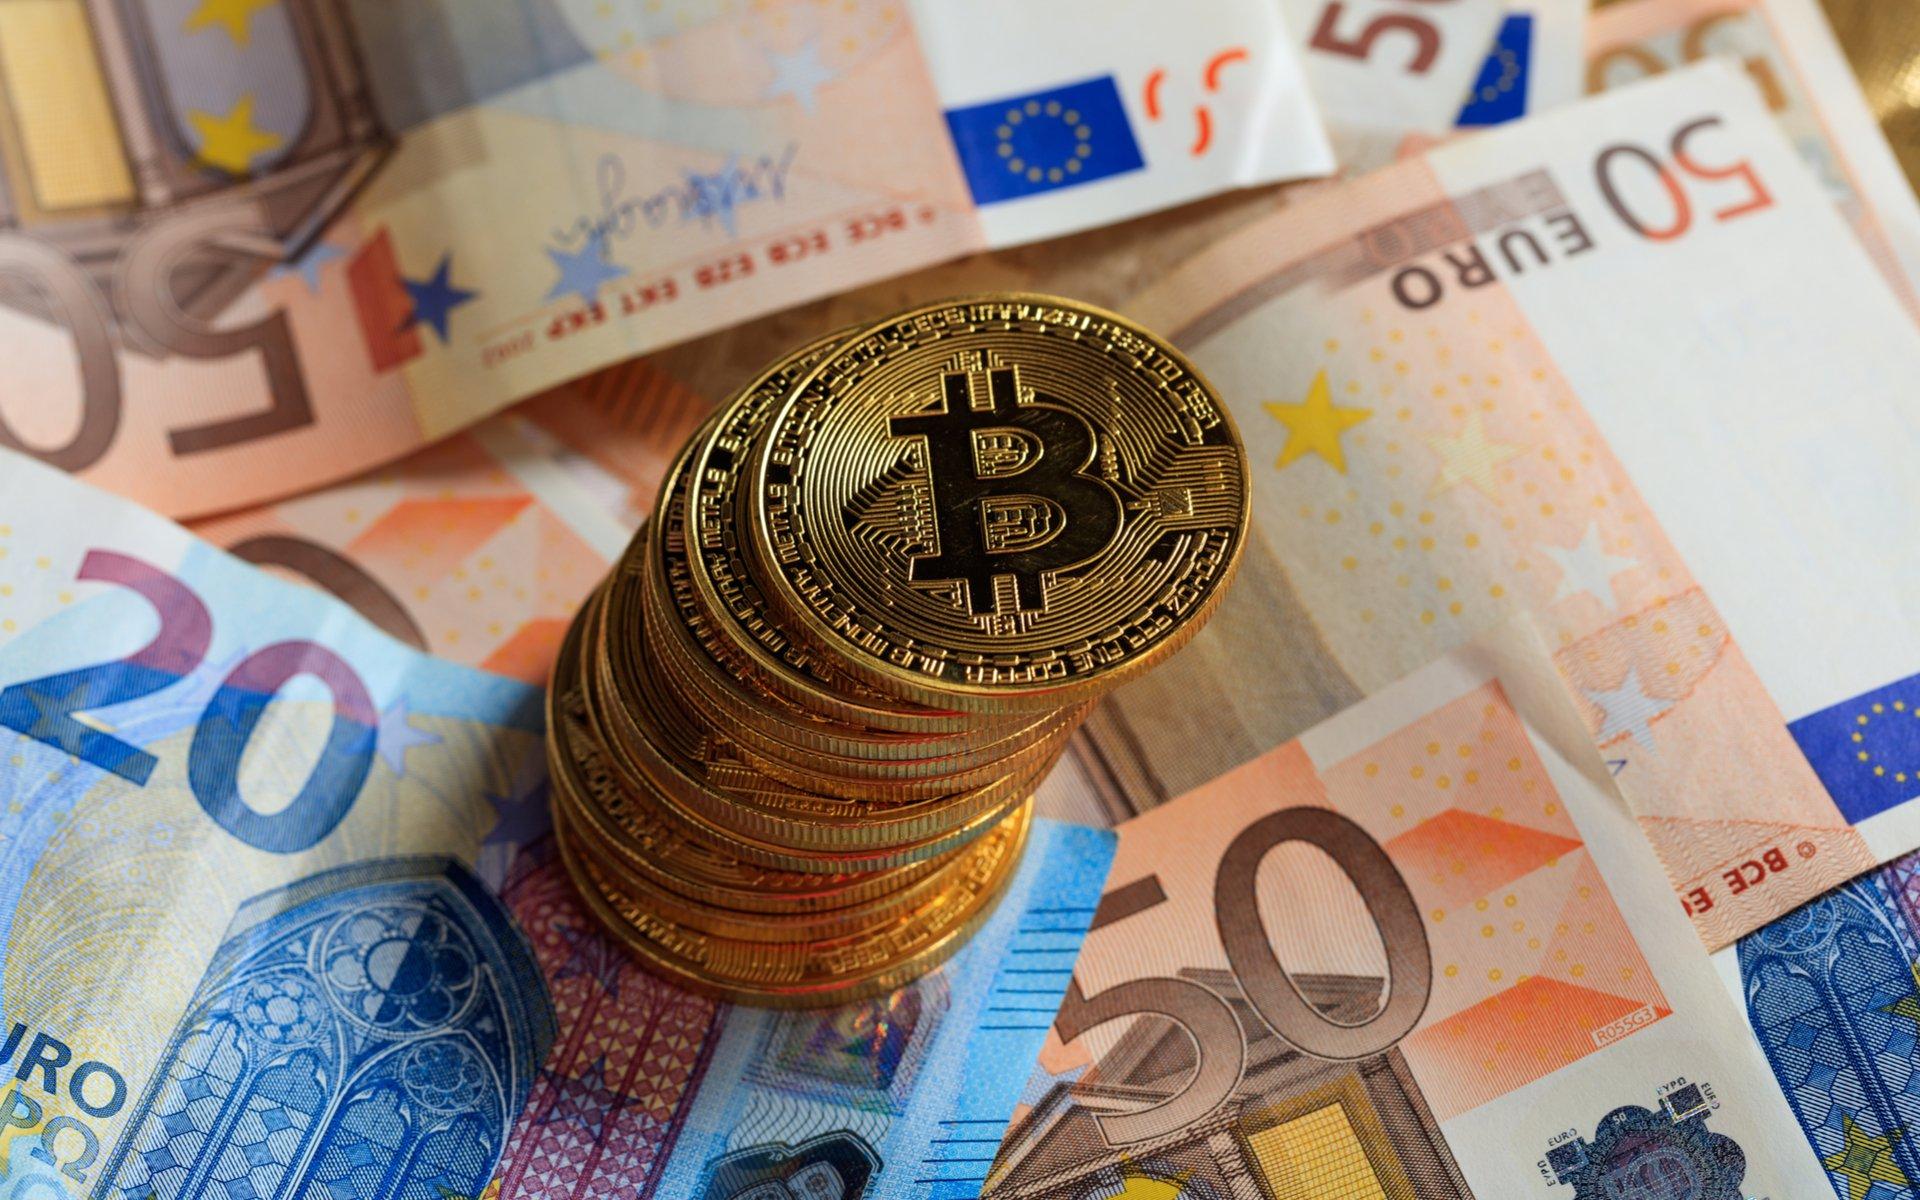 Binance to Launch Euro Trading Pairs This Year